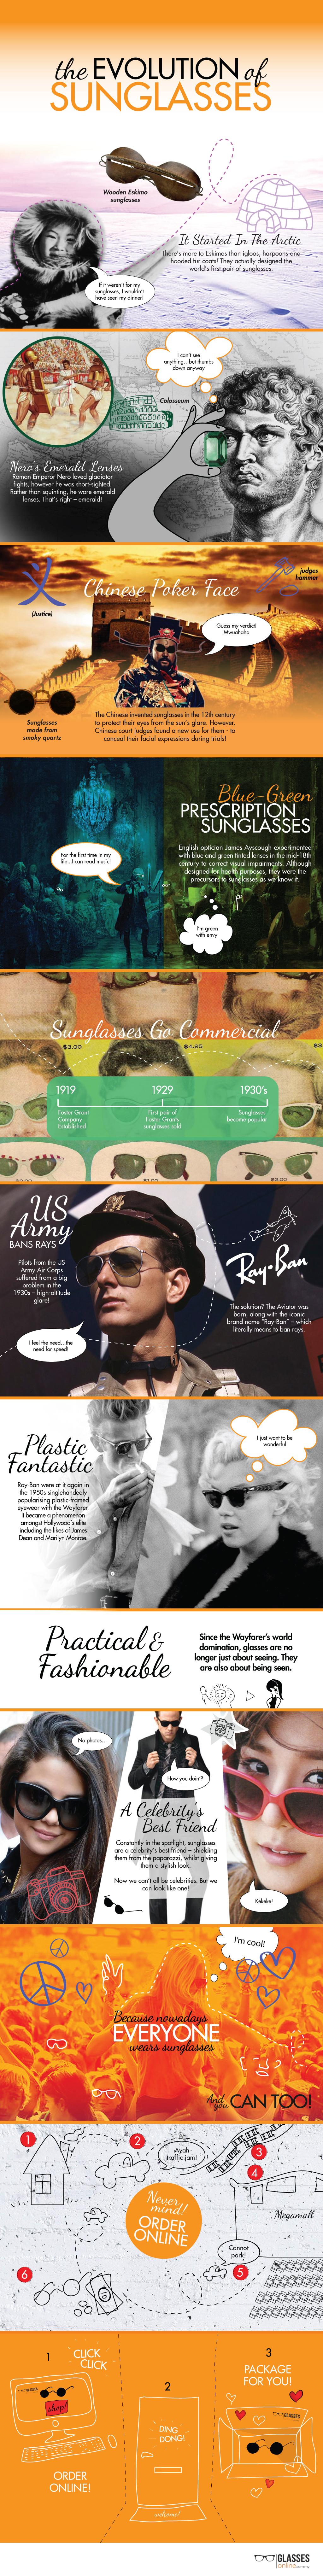 The Evolution Of Sunglasses